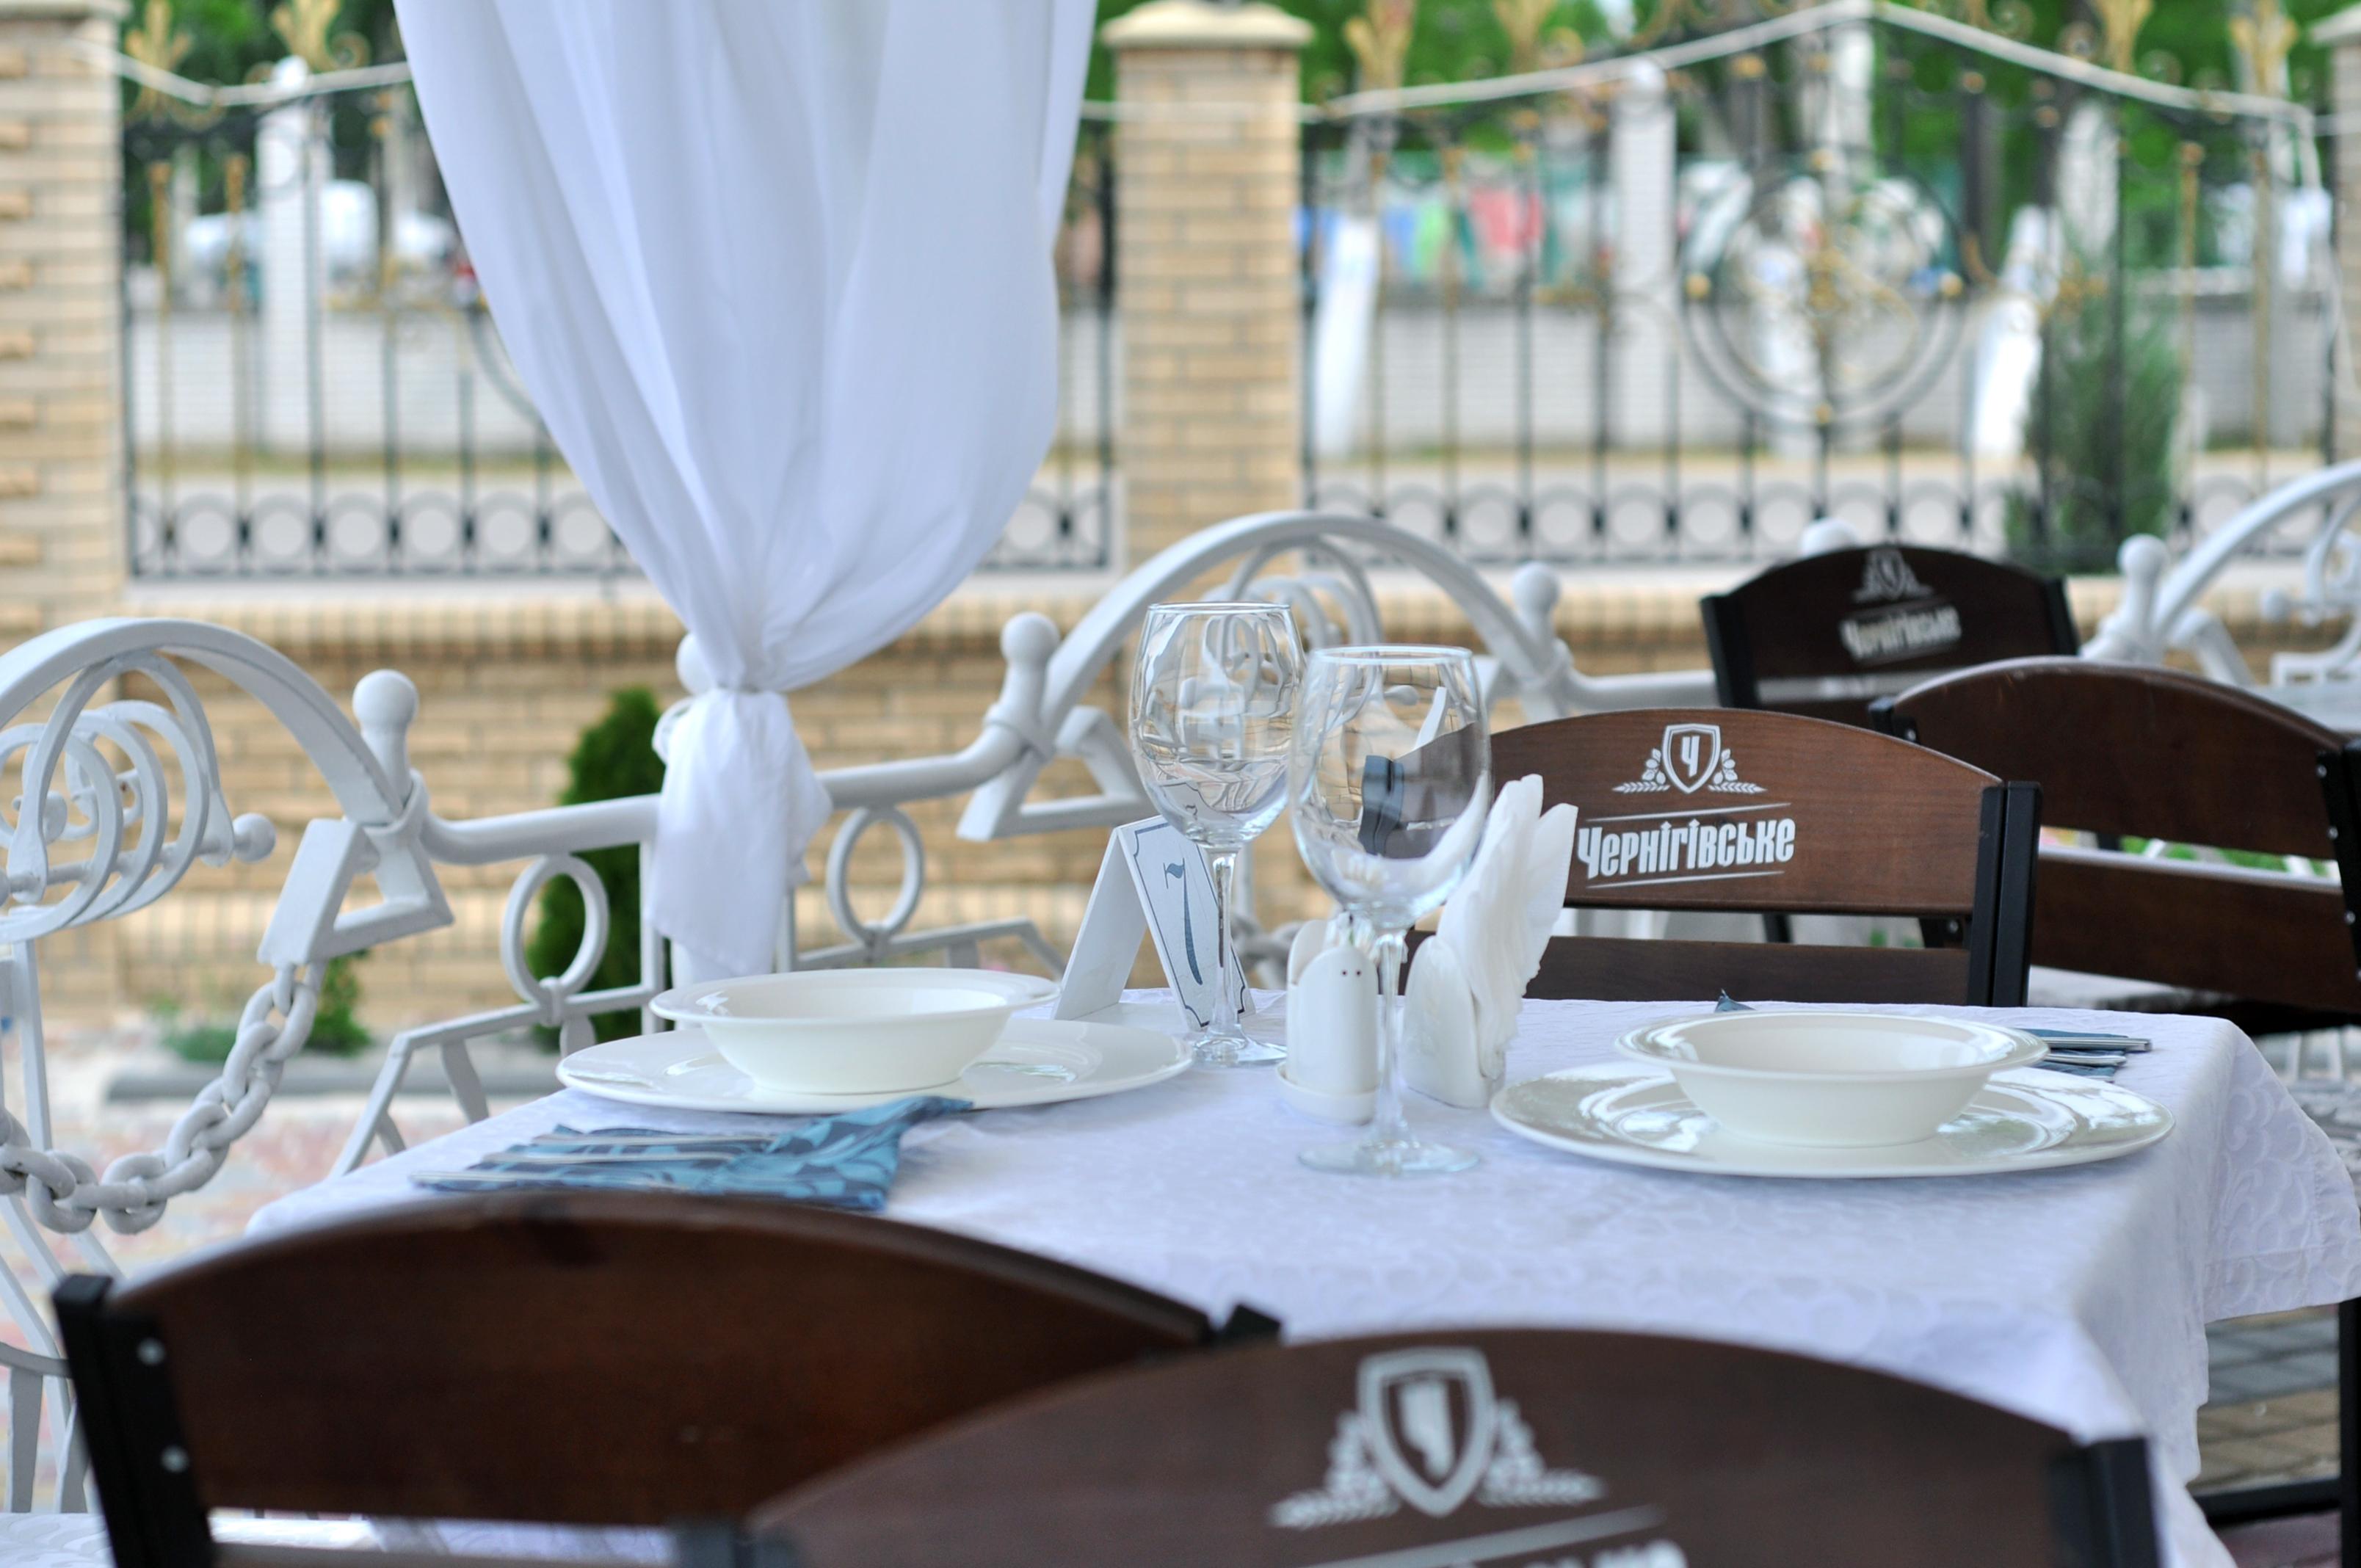 afina-hotel-restoran-berdjansk-5